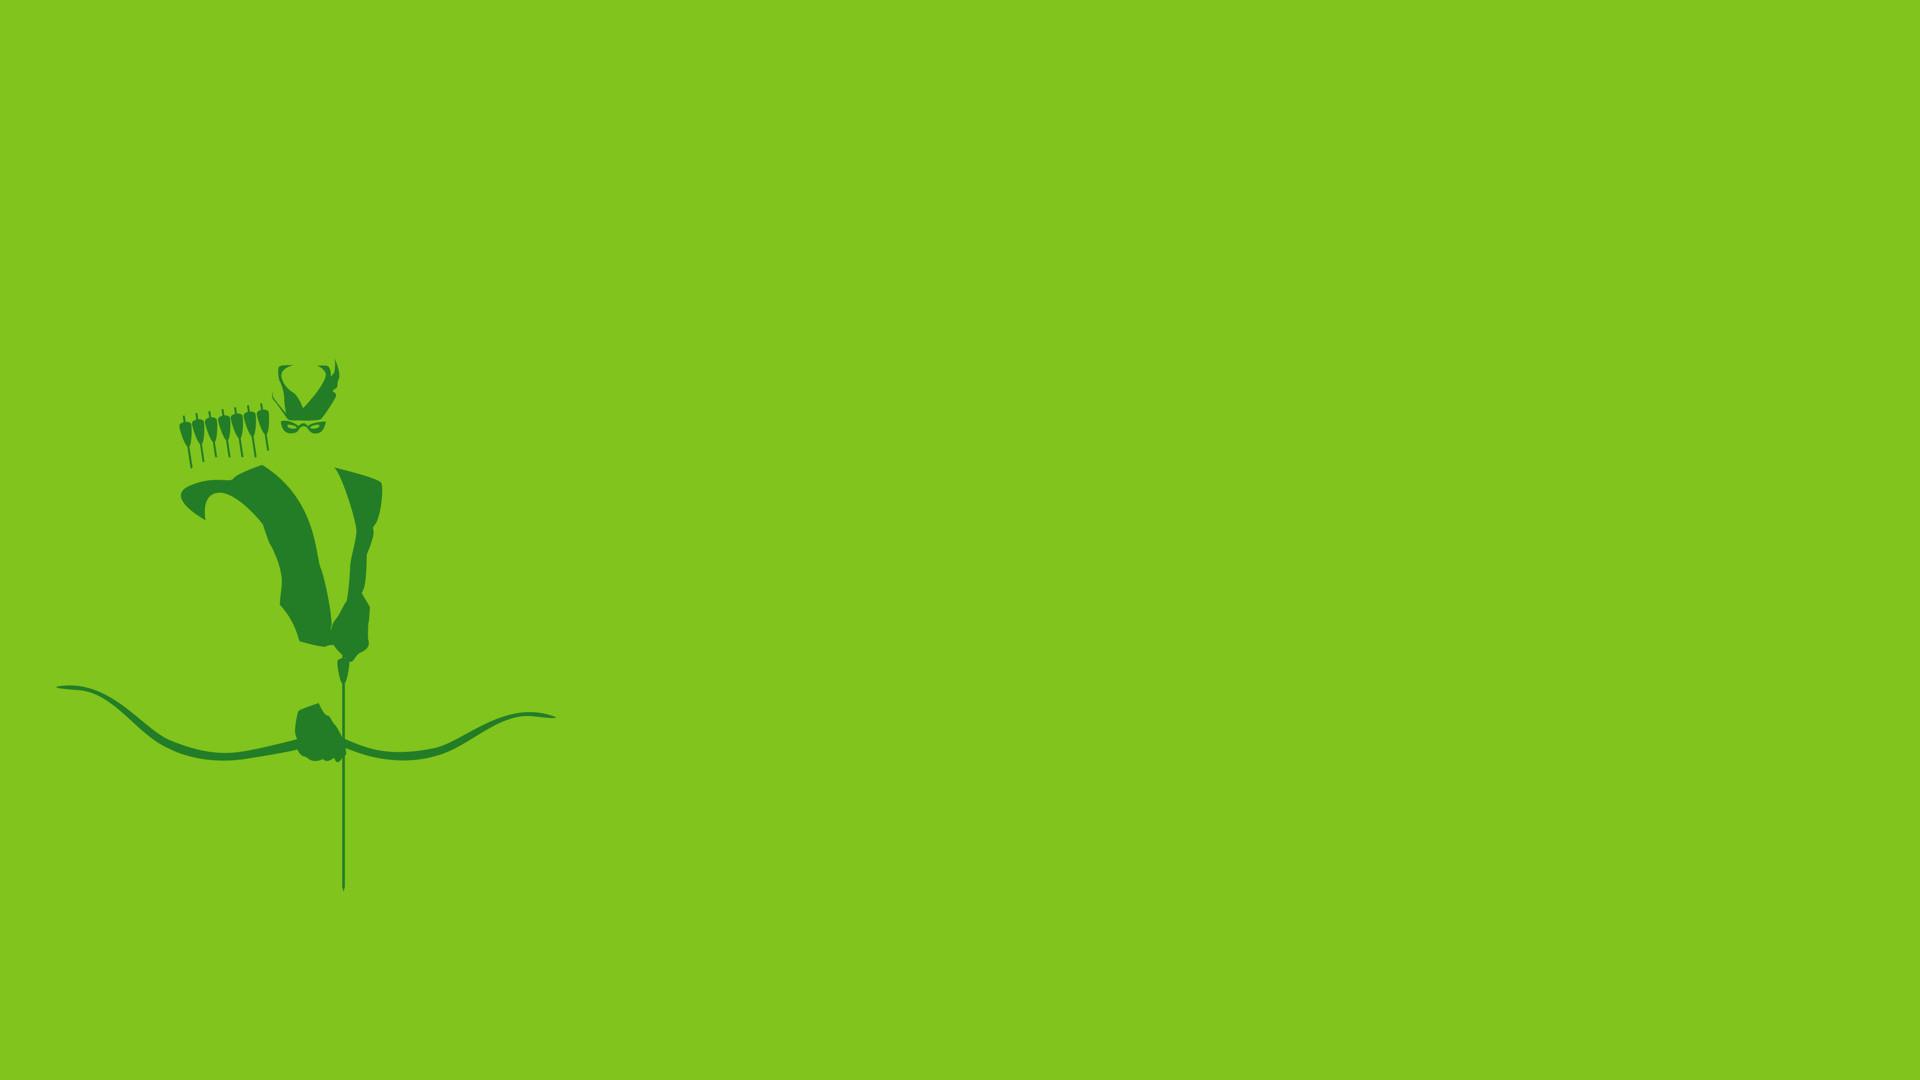 Green Arrow HD Wallpaper 1920×1080